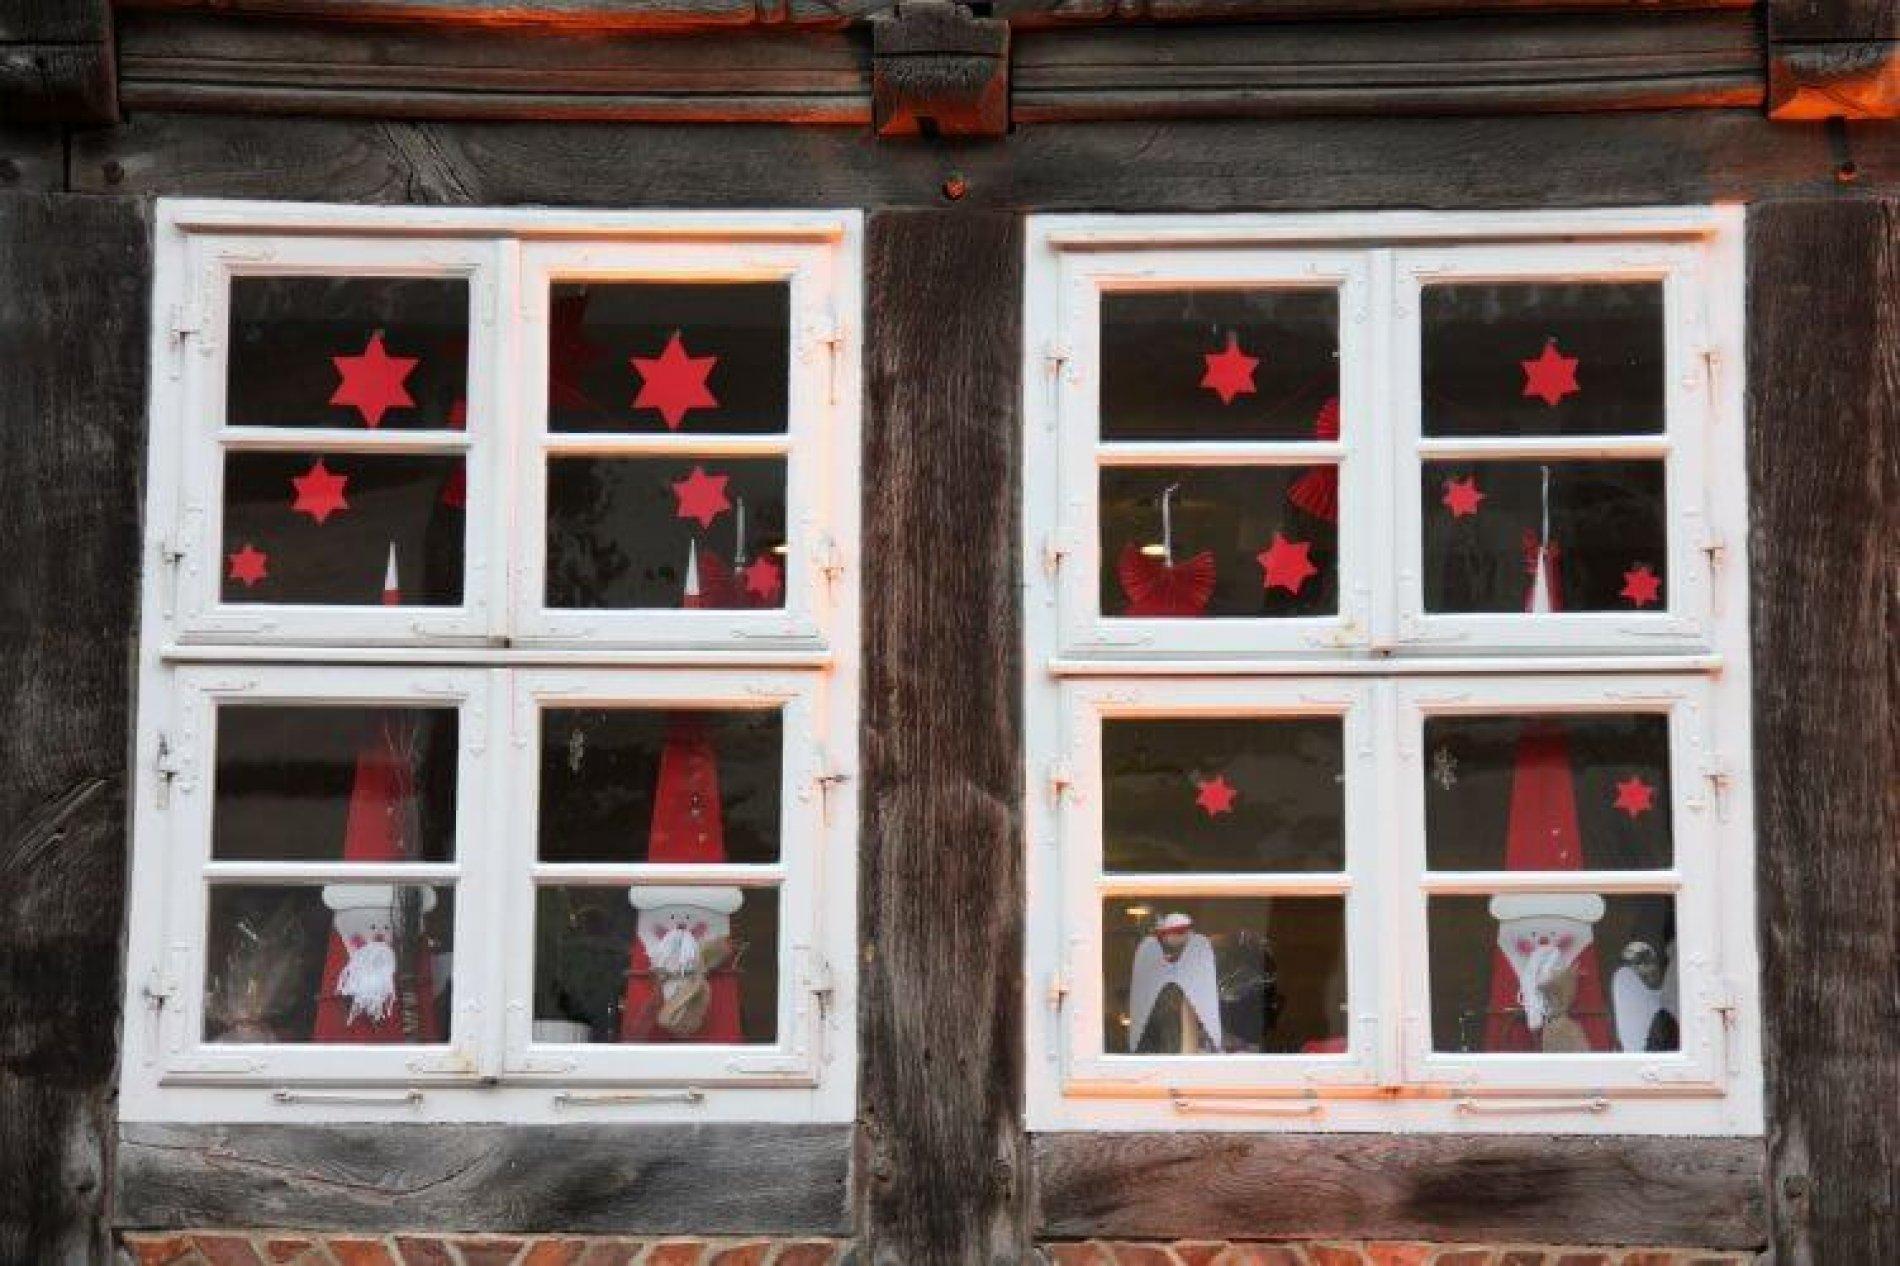 wood-house-star-window-glass-building-1010717-pxhere.com